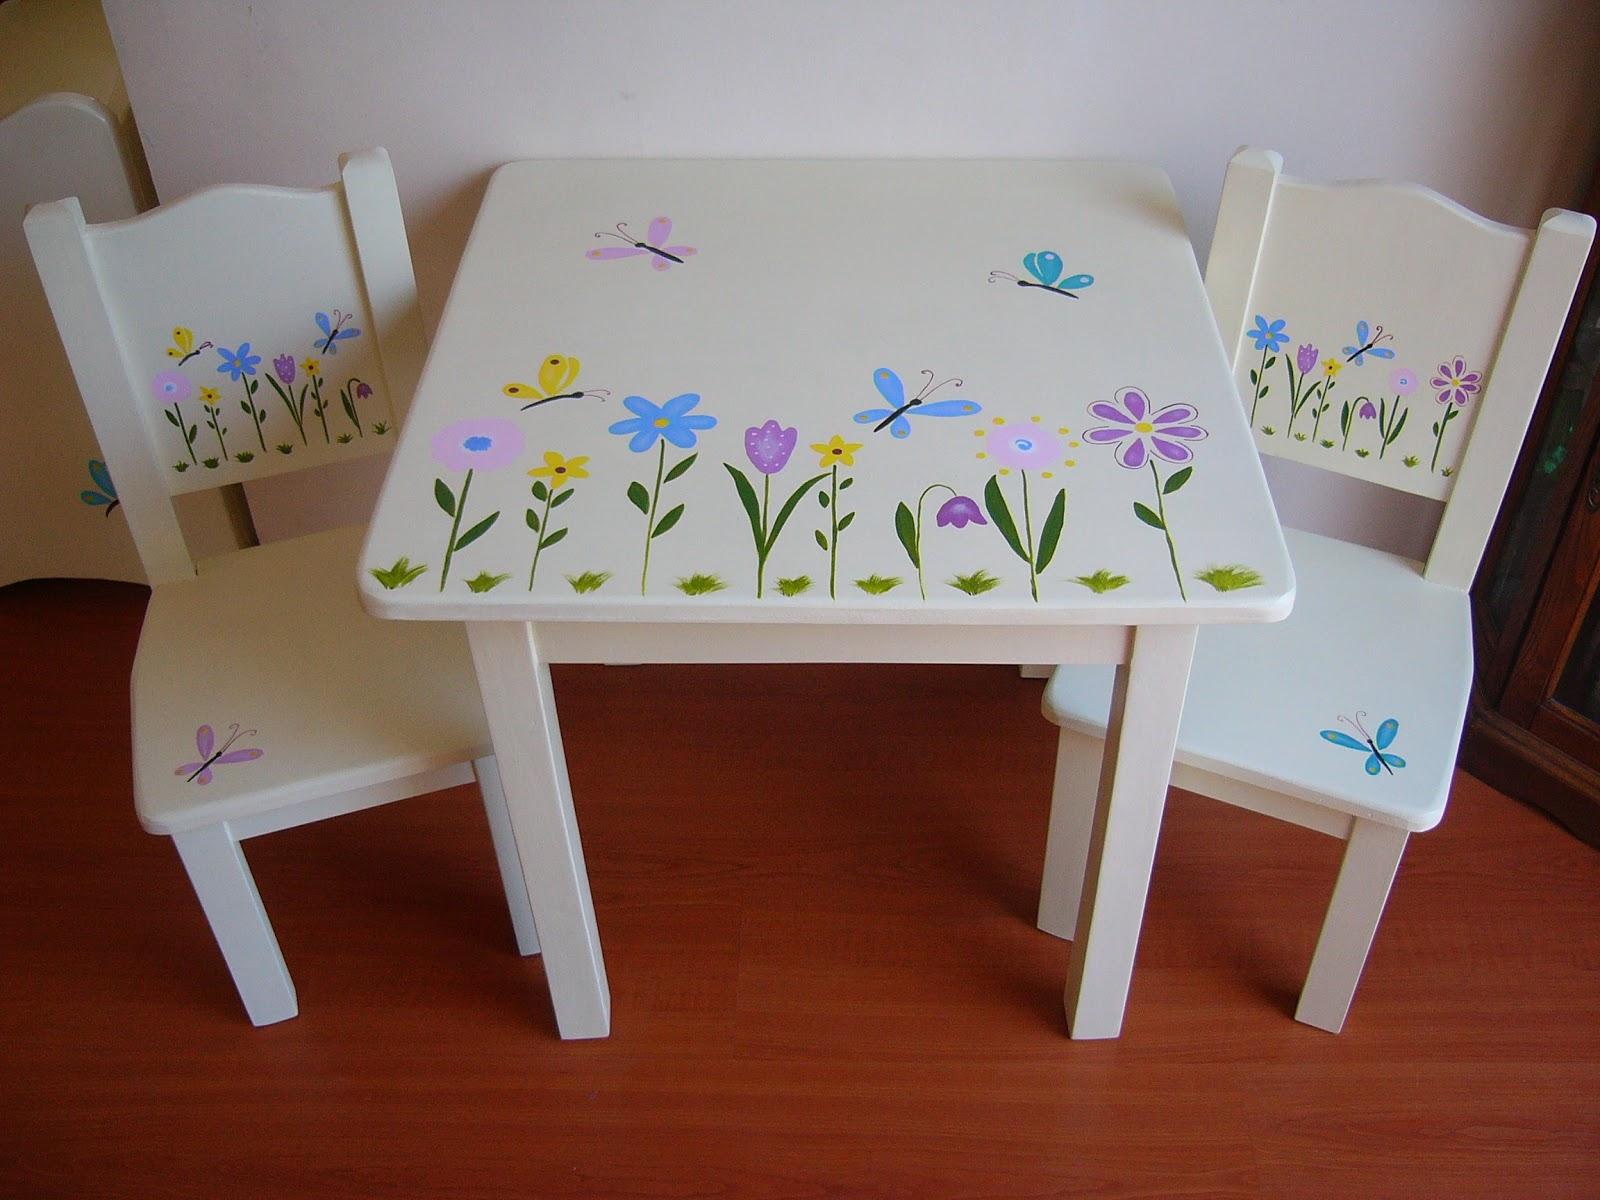 Muebles infantiles decoraci n para ni os juguetes - Sillas infantiles ...